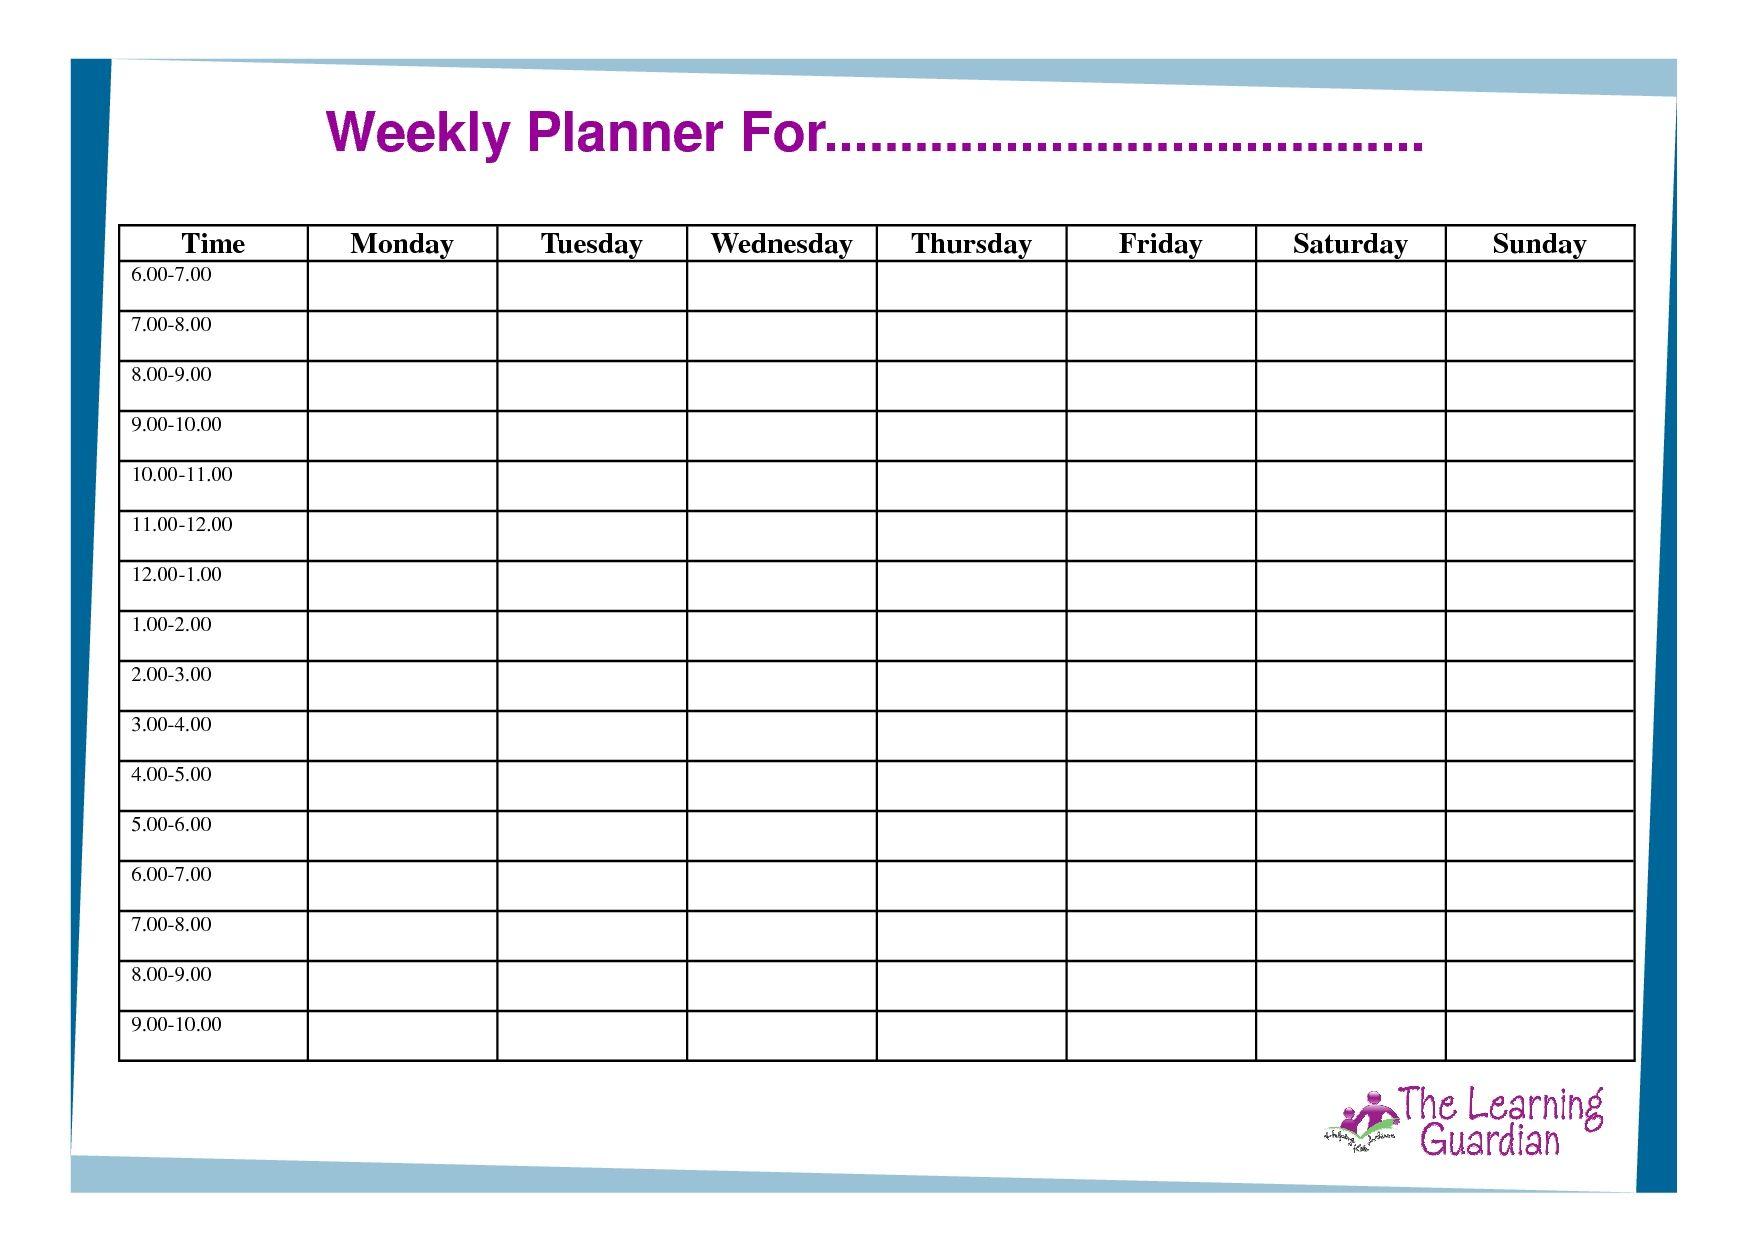 Free Printable Weekly Calendar Templates Weekly Planner For Time Free Printab Weekly Calendar Template Weekly Calendar Printable Free Printable Weekly Calendar One week calendar with hours